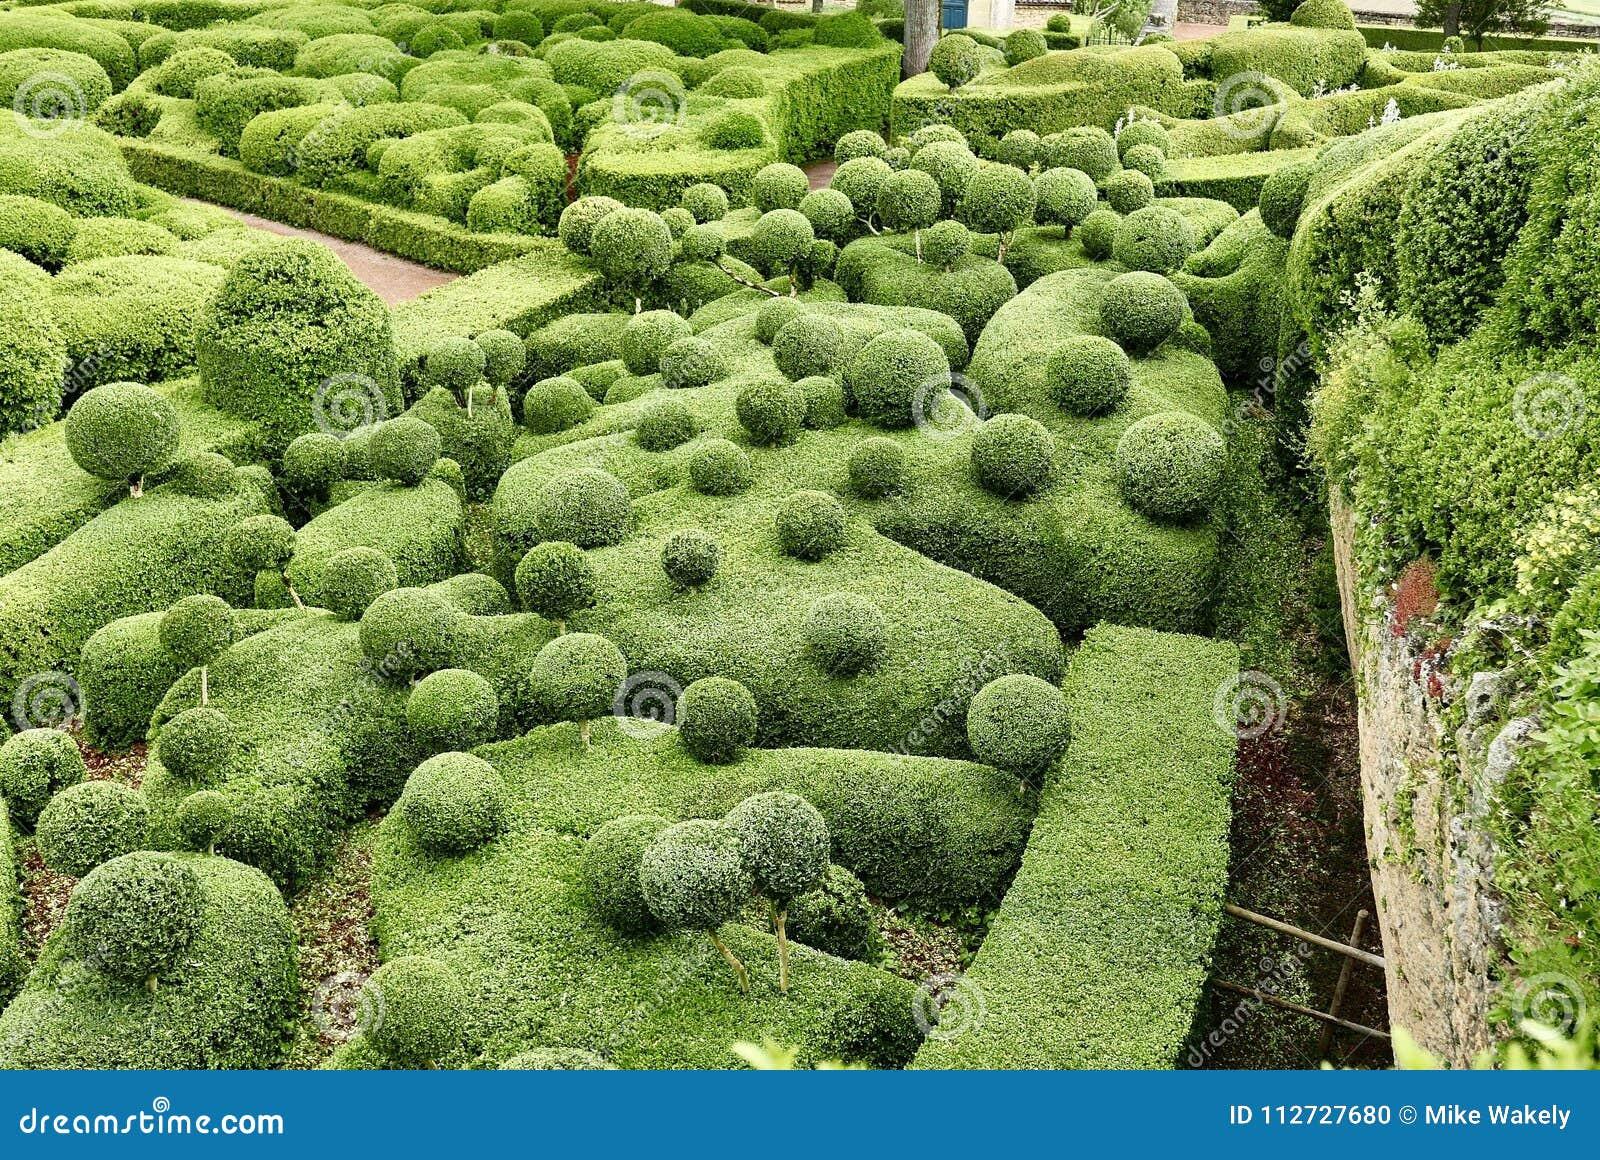 Jardin Marqueyssac Near La Roque Cageac In Dordogne Stock